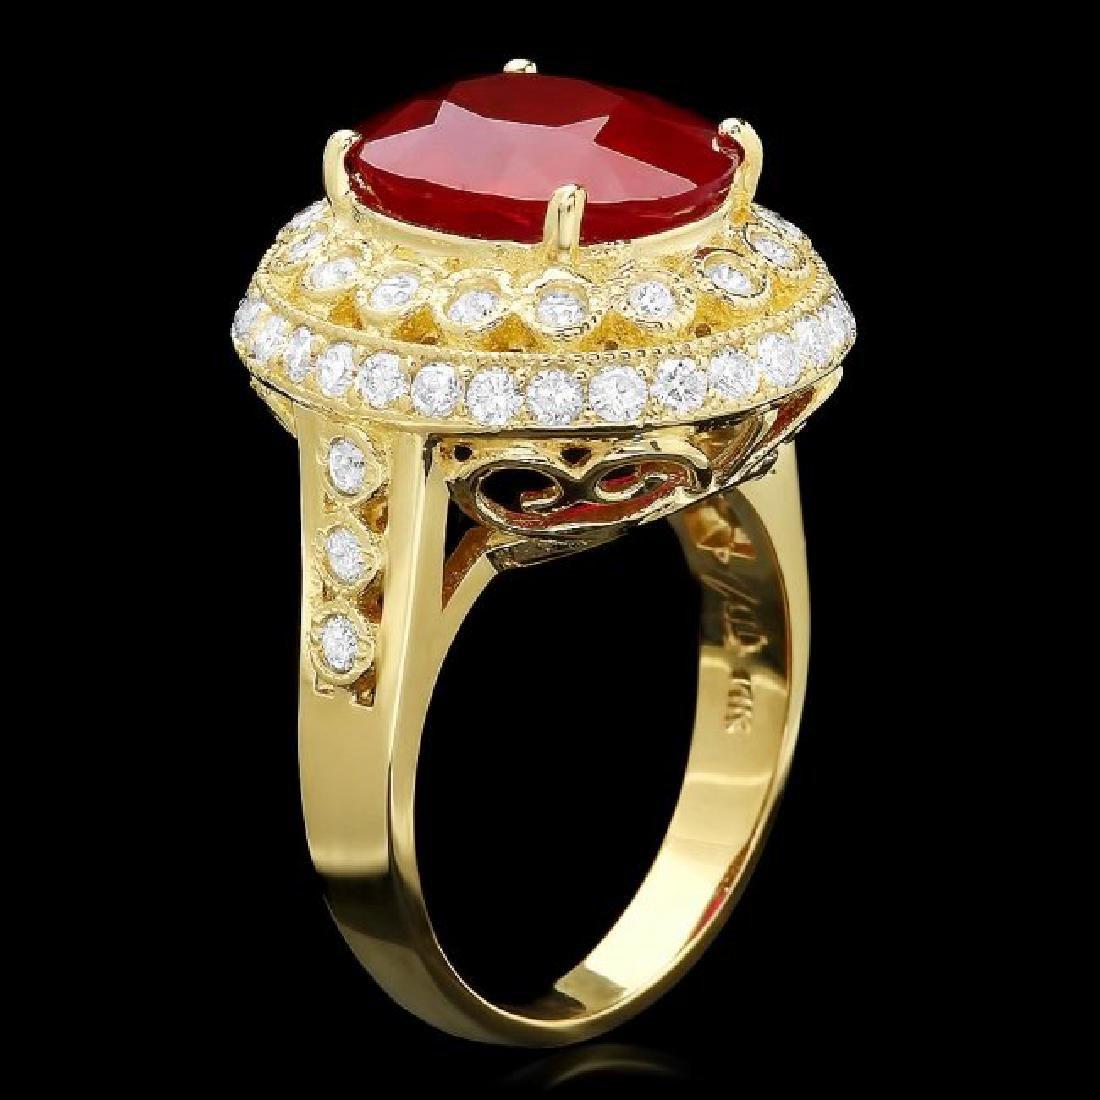 14k Yellow Gold 6.00ct Ruby 1.10ct Diamond Ring - 2